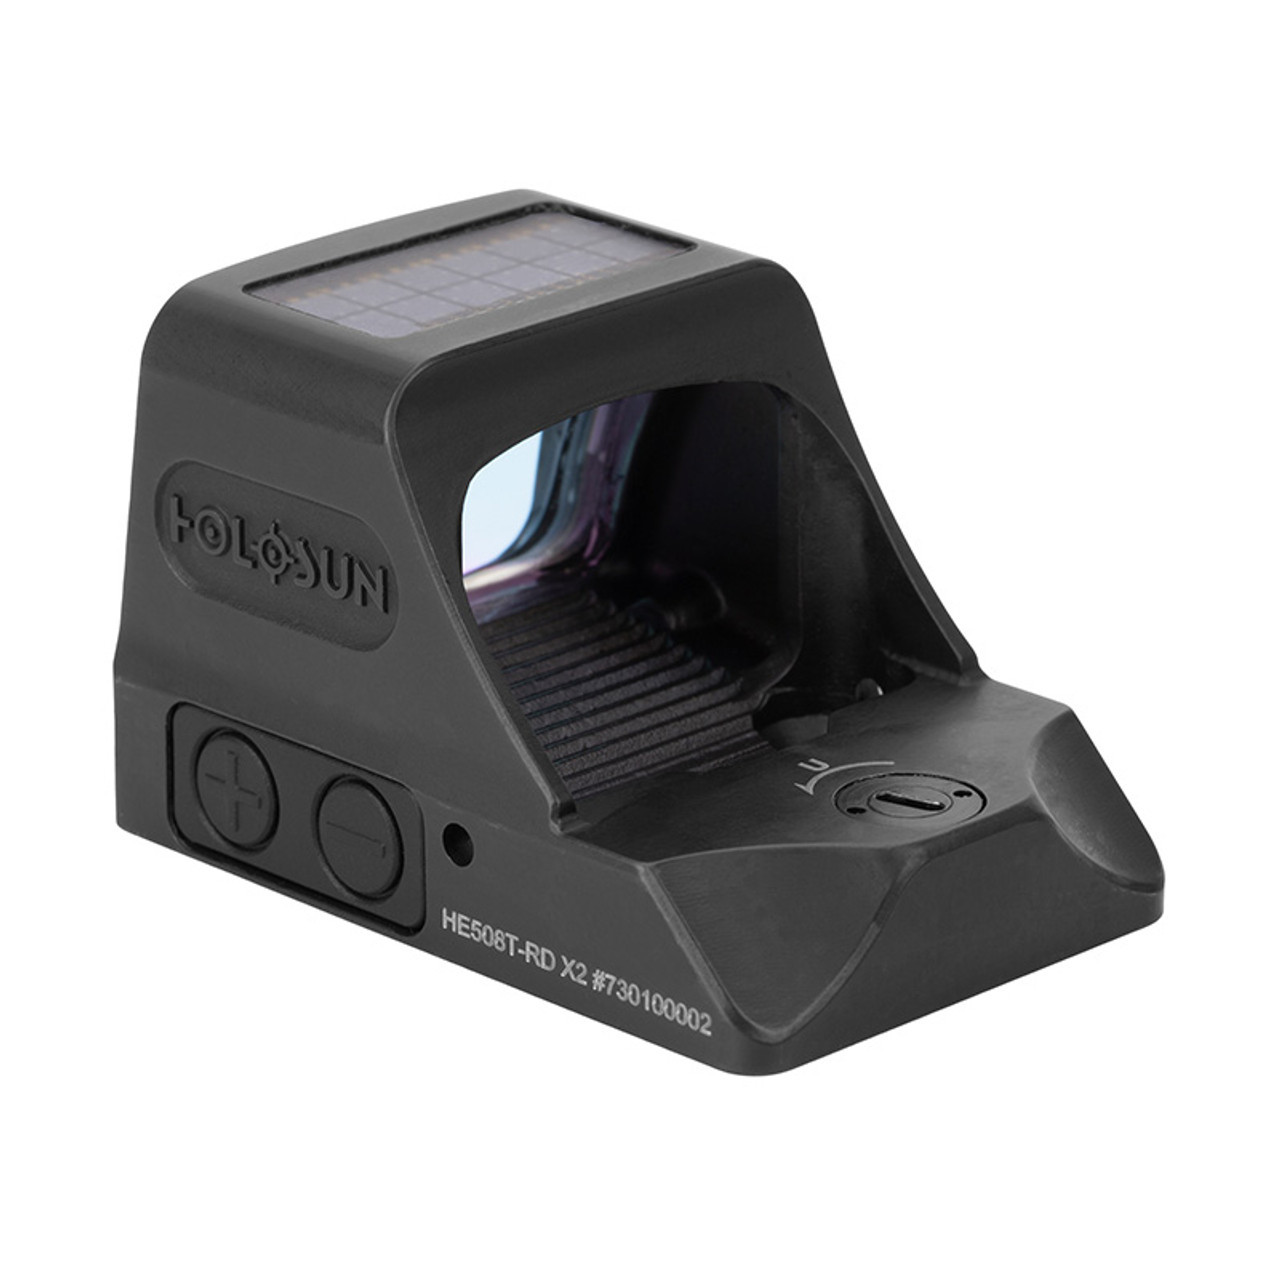 HOLOSUN 508T X2 Red Dot Pistol Optic